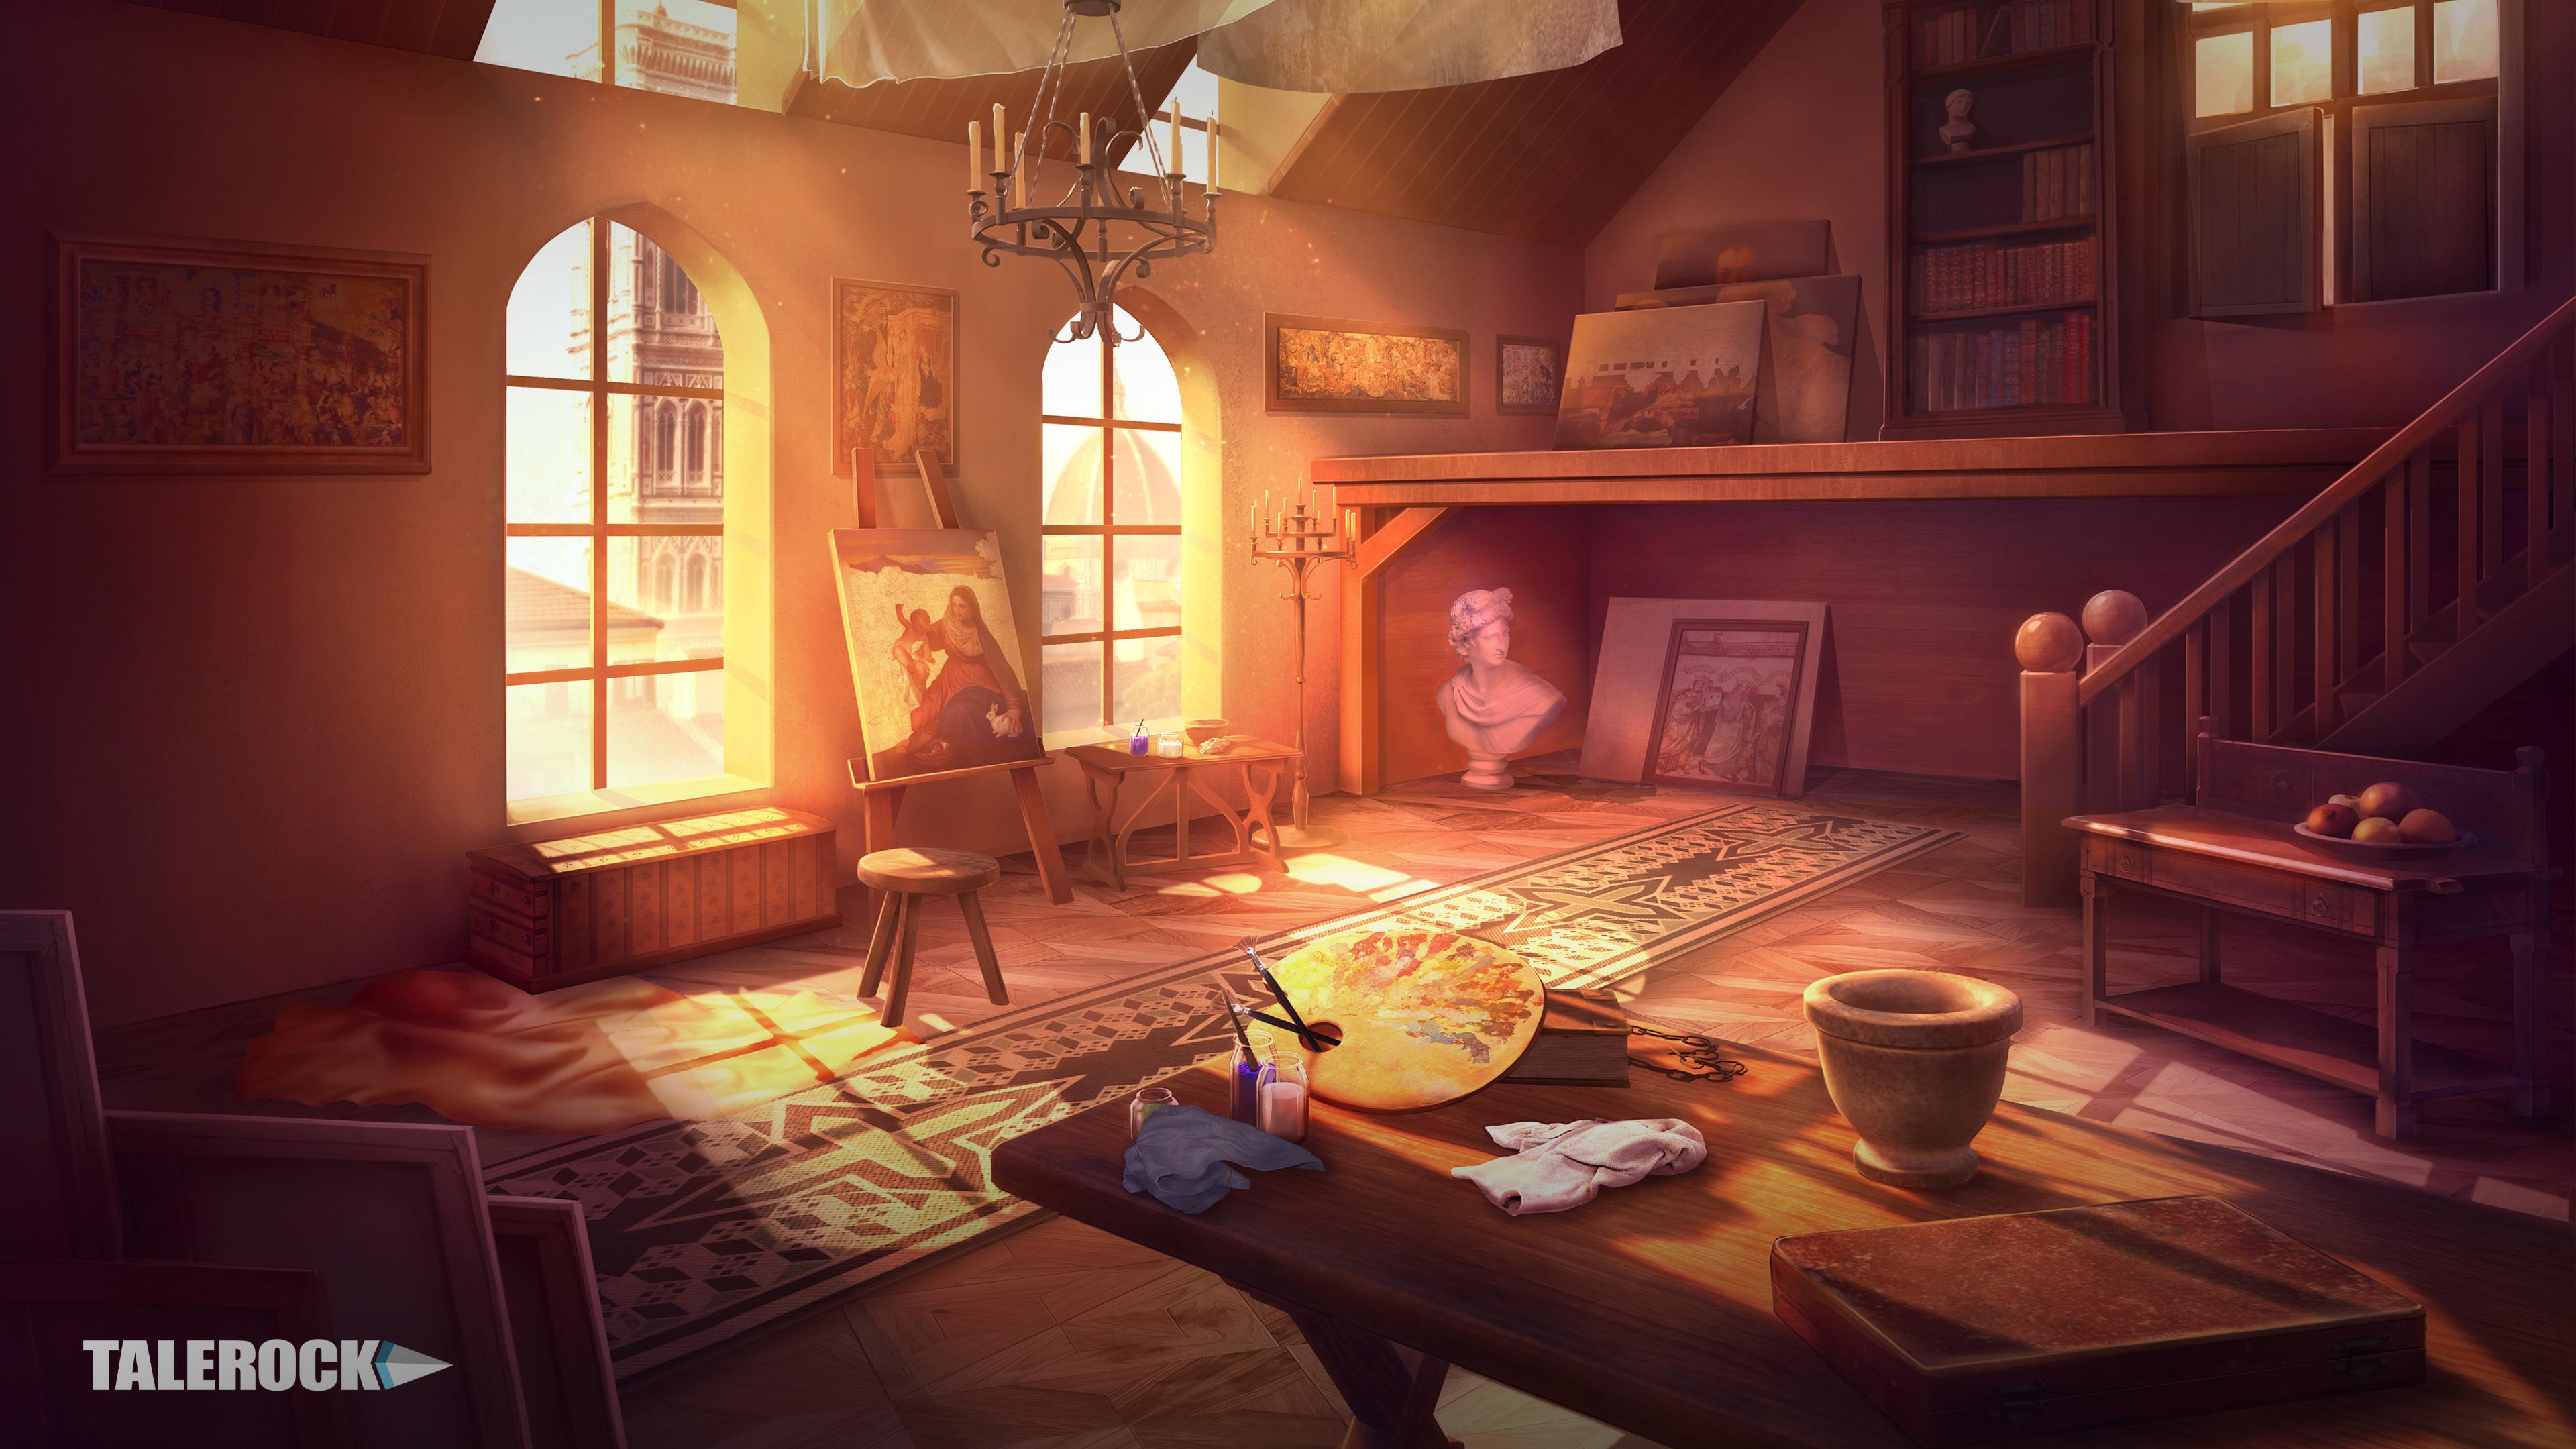 Artist's Room